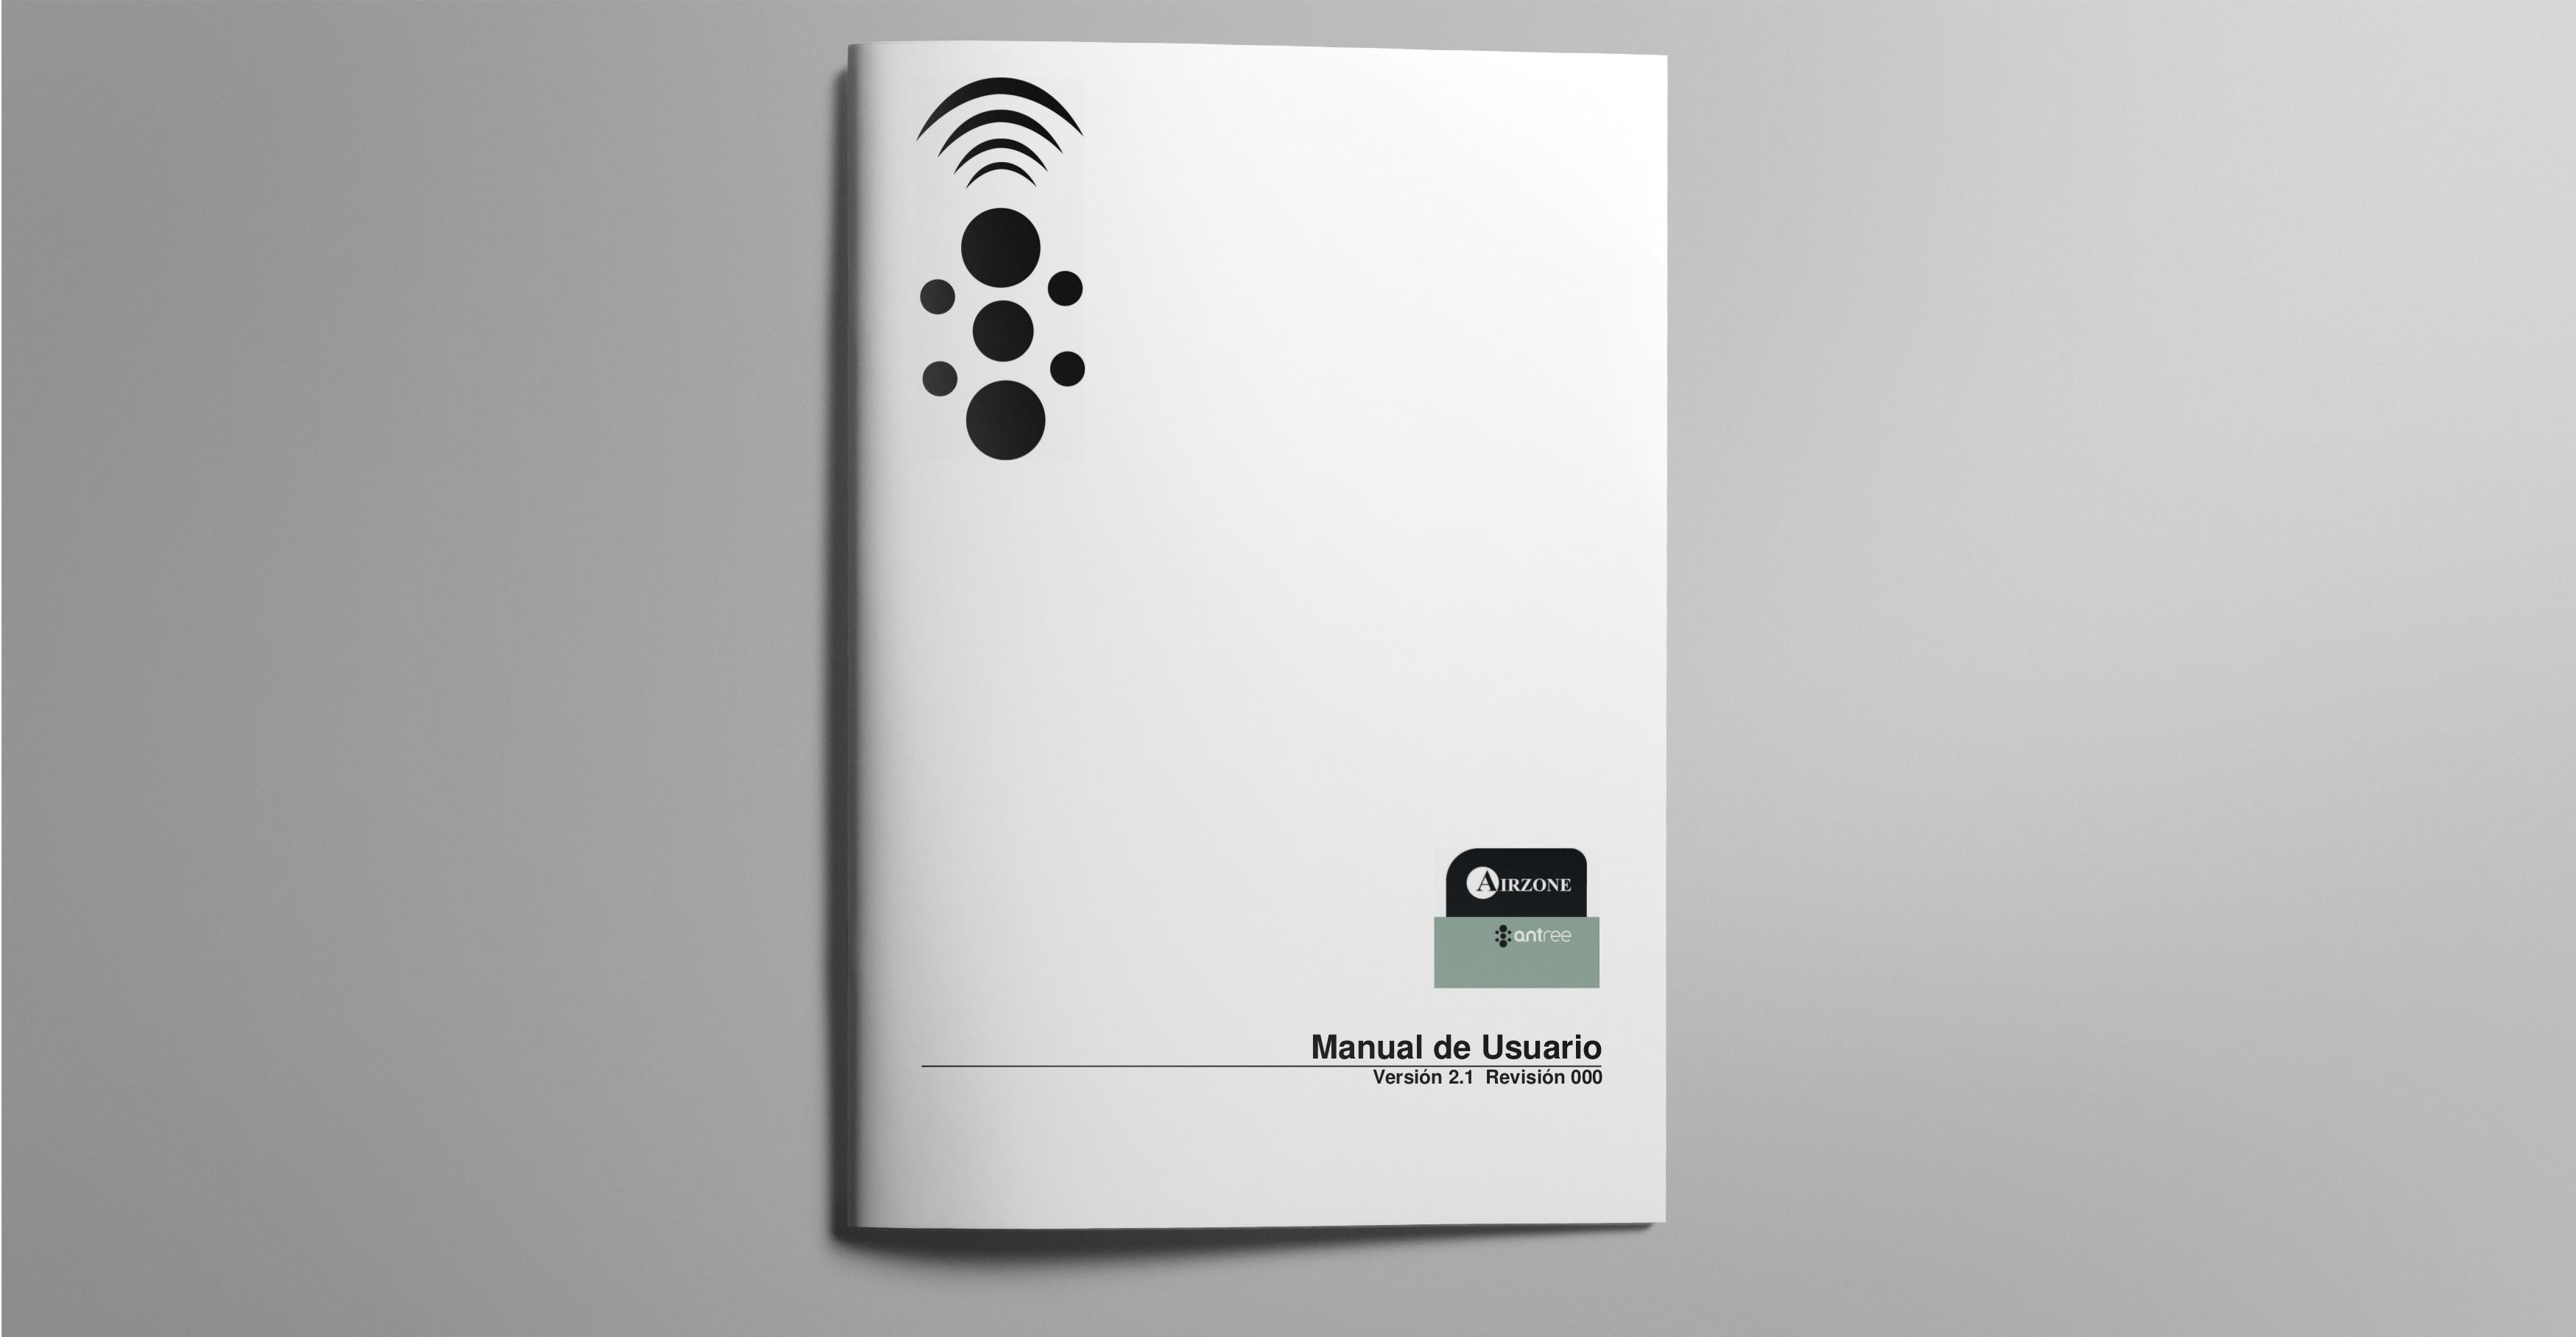 Manual de uso antree (2008-2012)